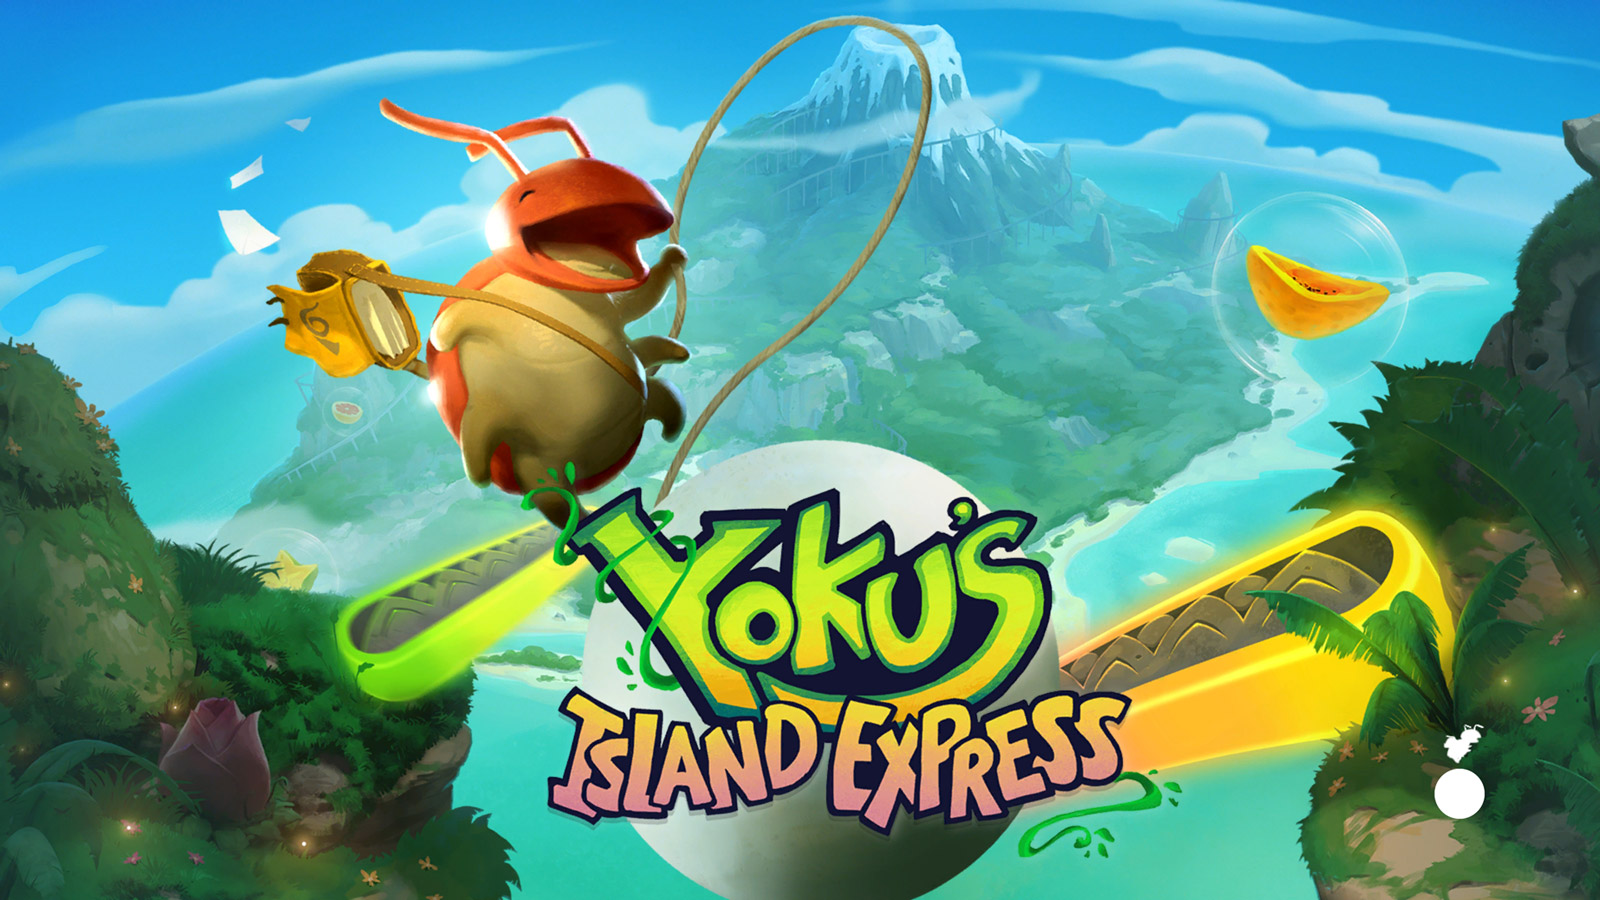 Free Yoku's Island Express Wallpaper in 1600x900